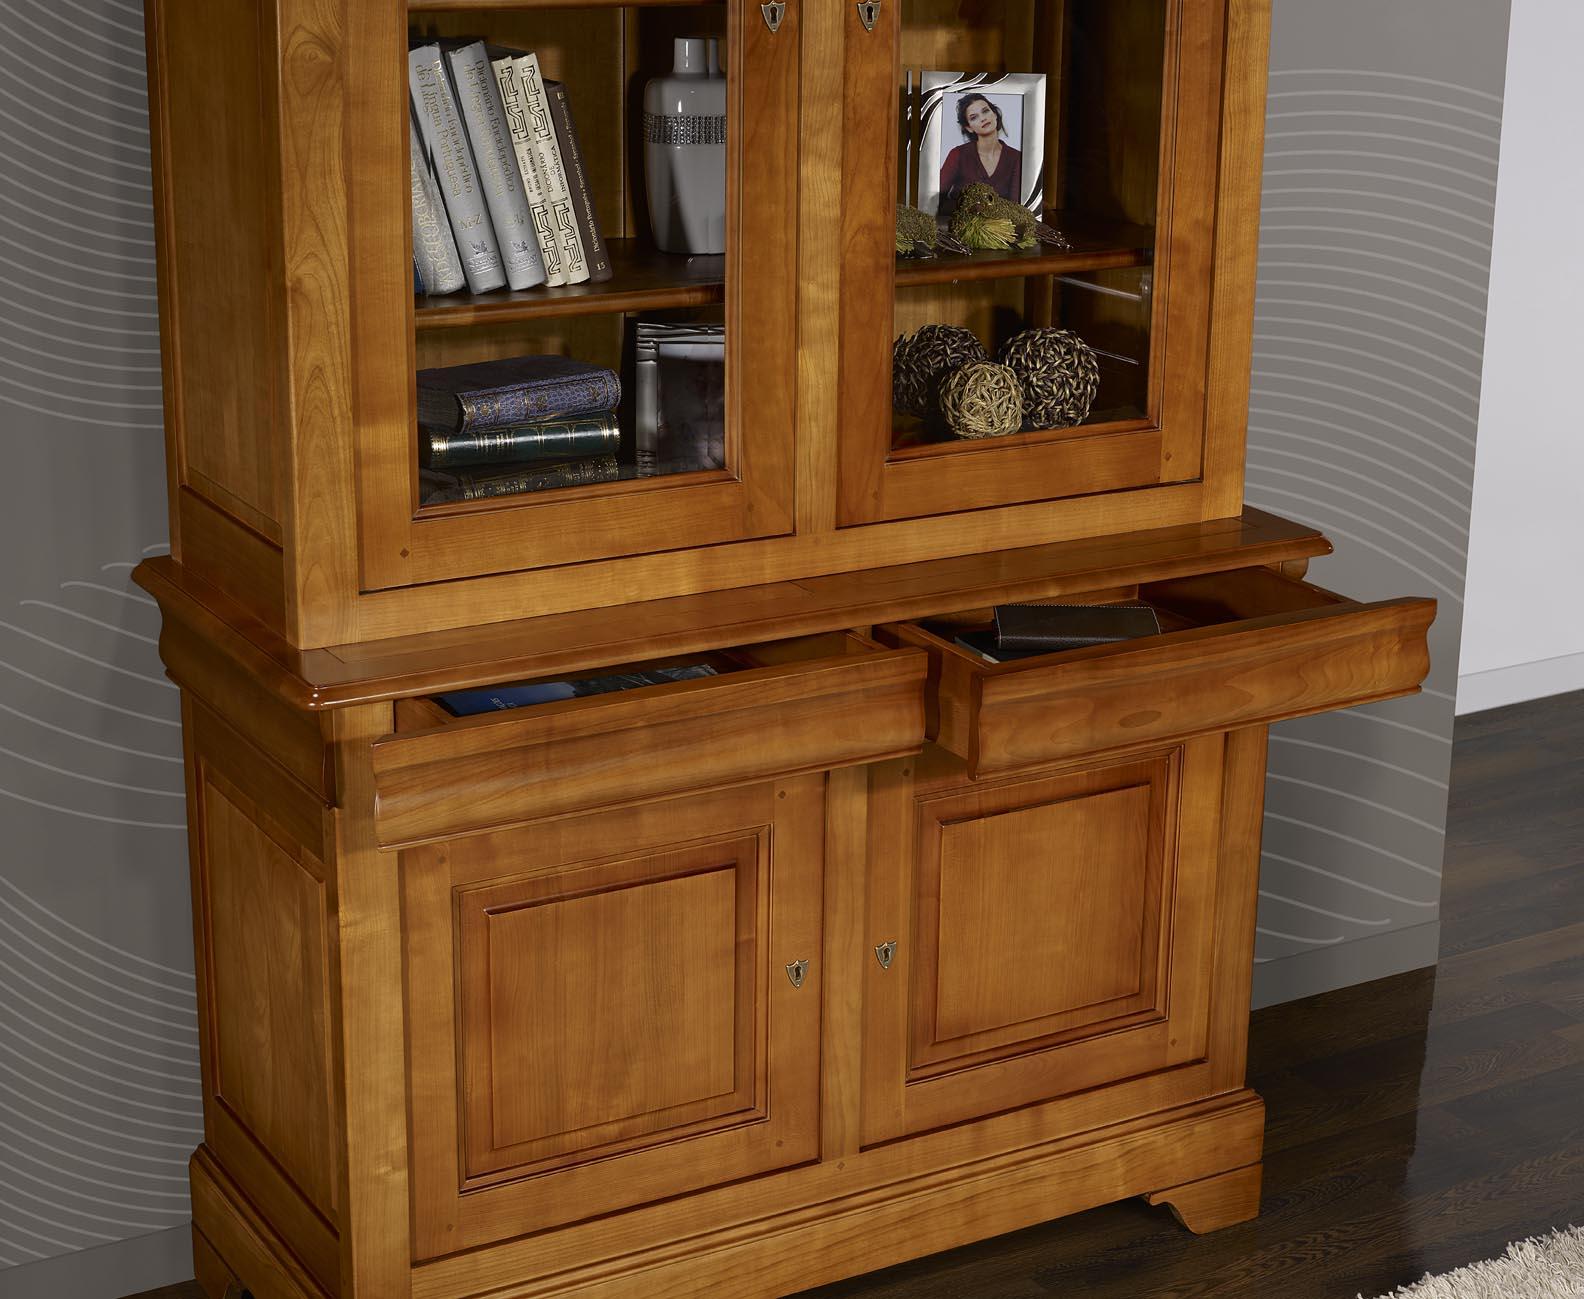 biblioth que 2 corps 2 portes en merisier massif de style. Black Bedroom Furniture Sets. Home Design Ideas